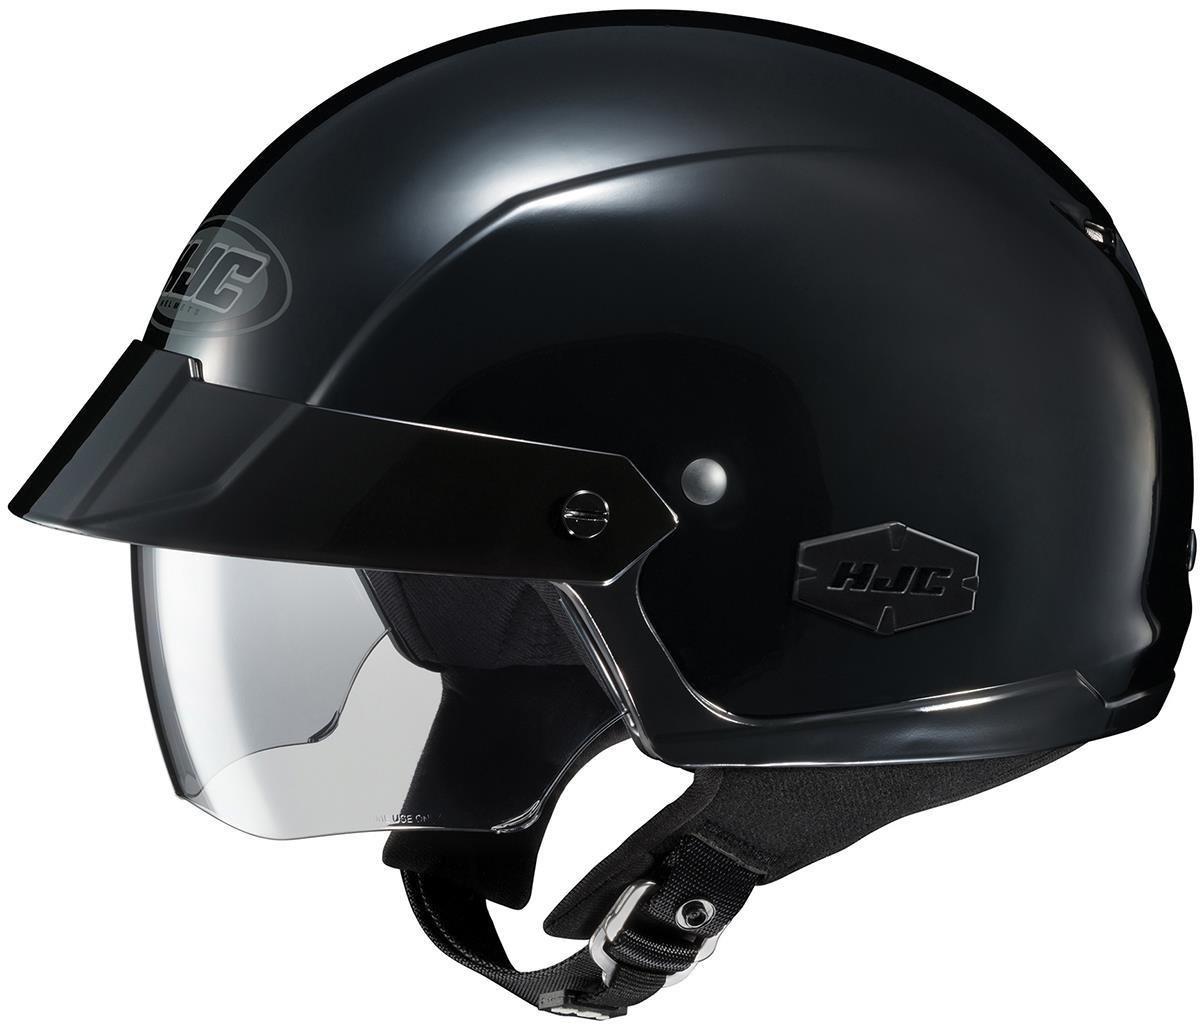 HJC Solid IS-Cruiser Half Shell Motorcycle Helmet